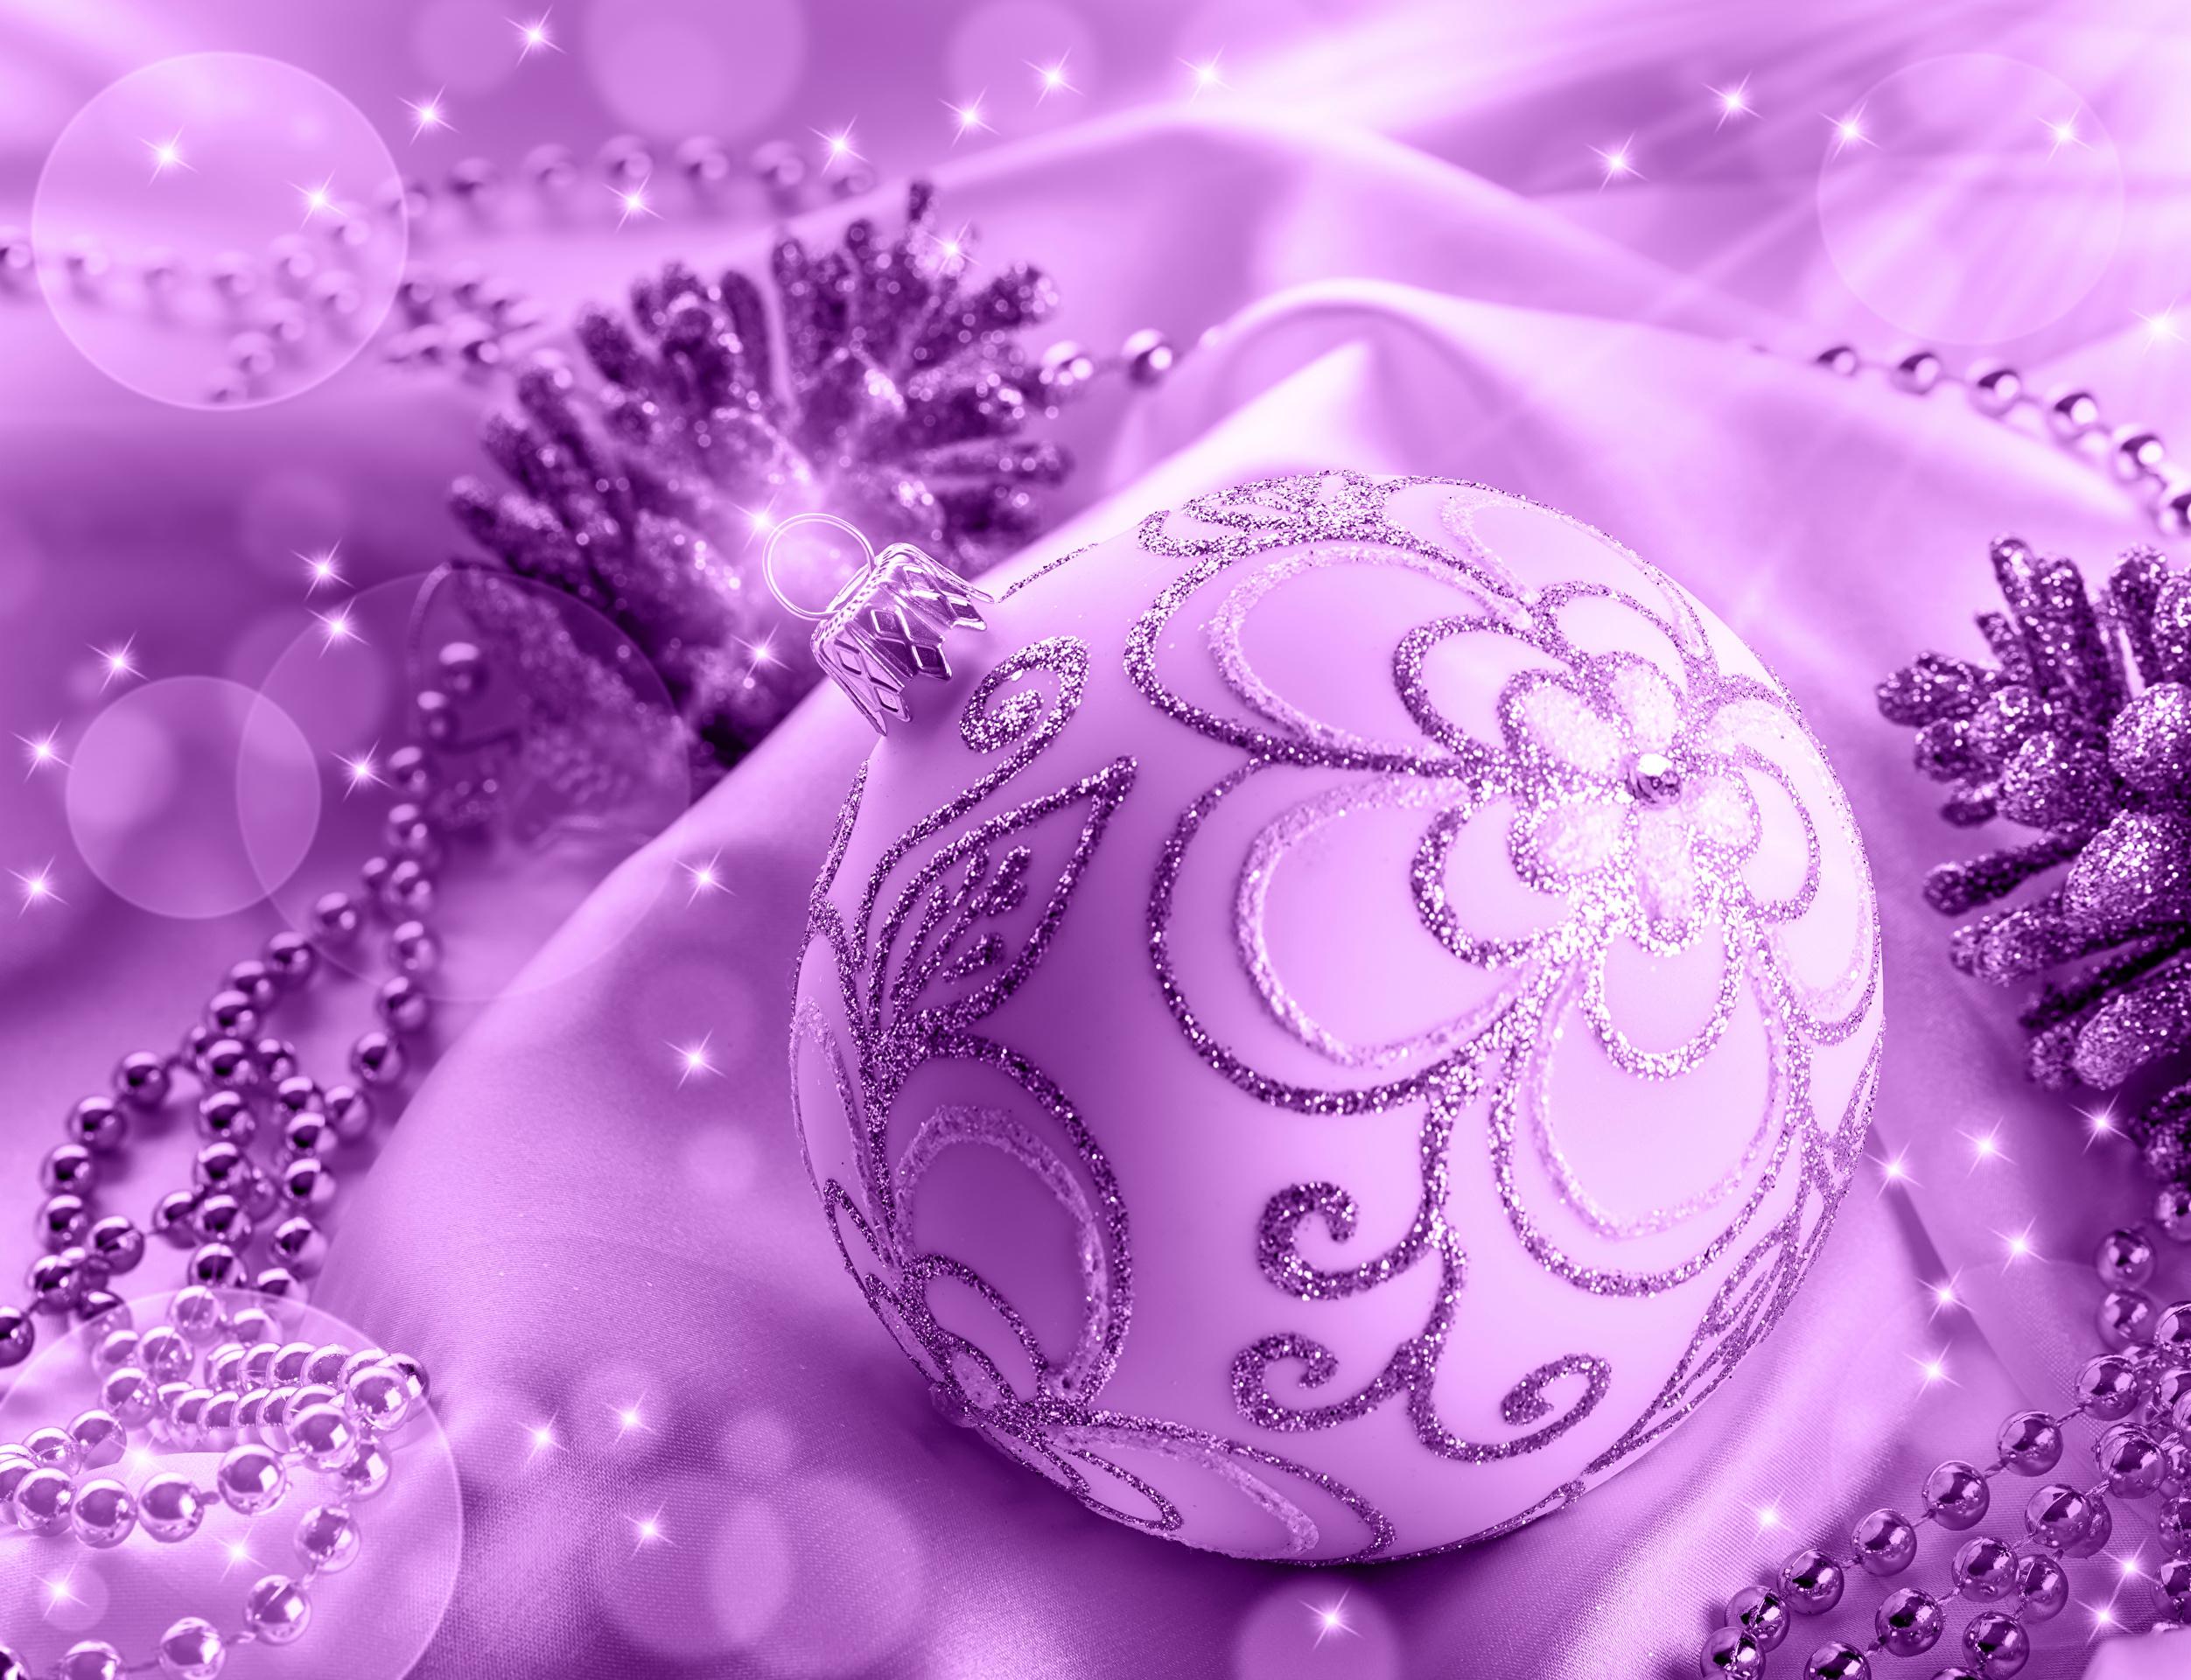 Purple christmas balls wallpapers high quality download free - Purple christmas desktop wallpaper ...